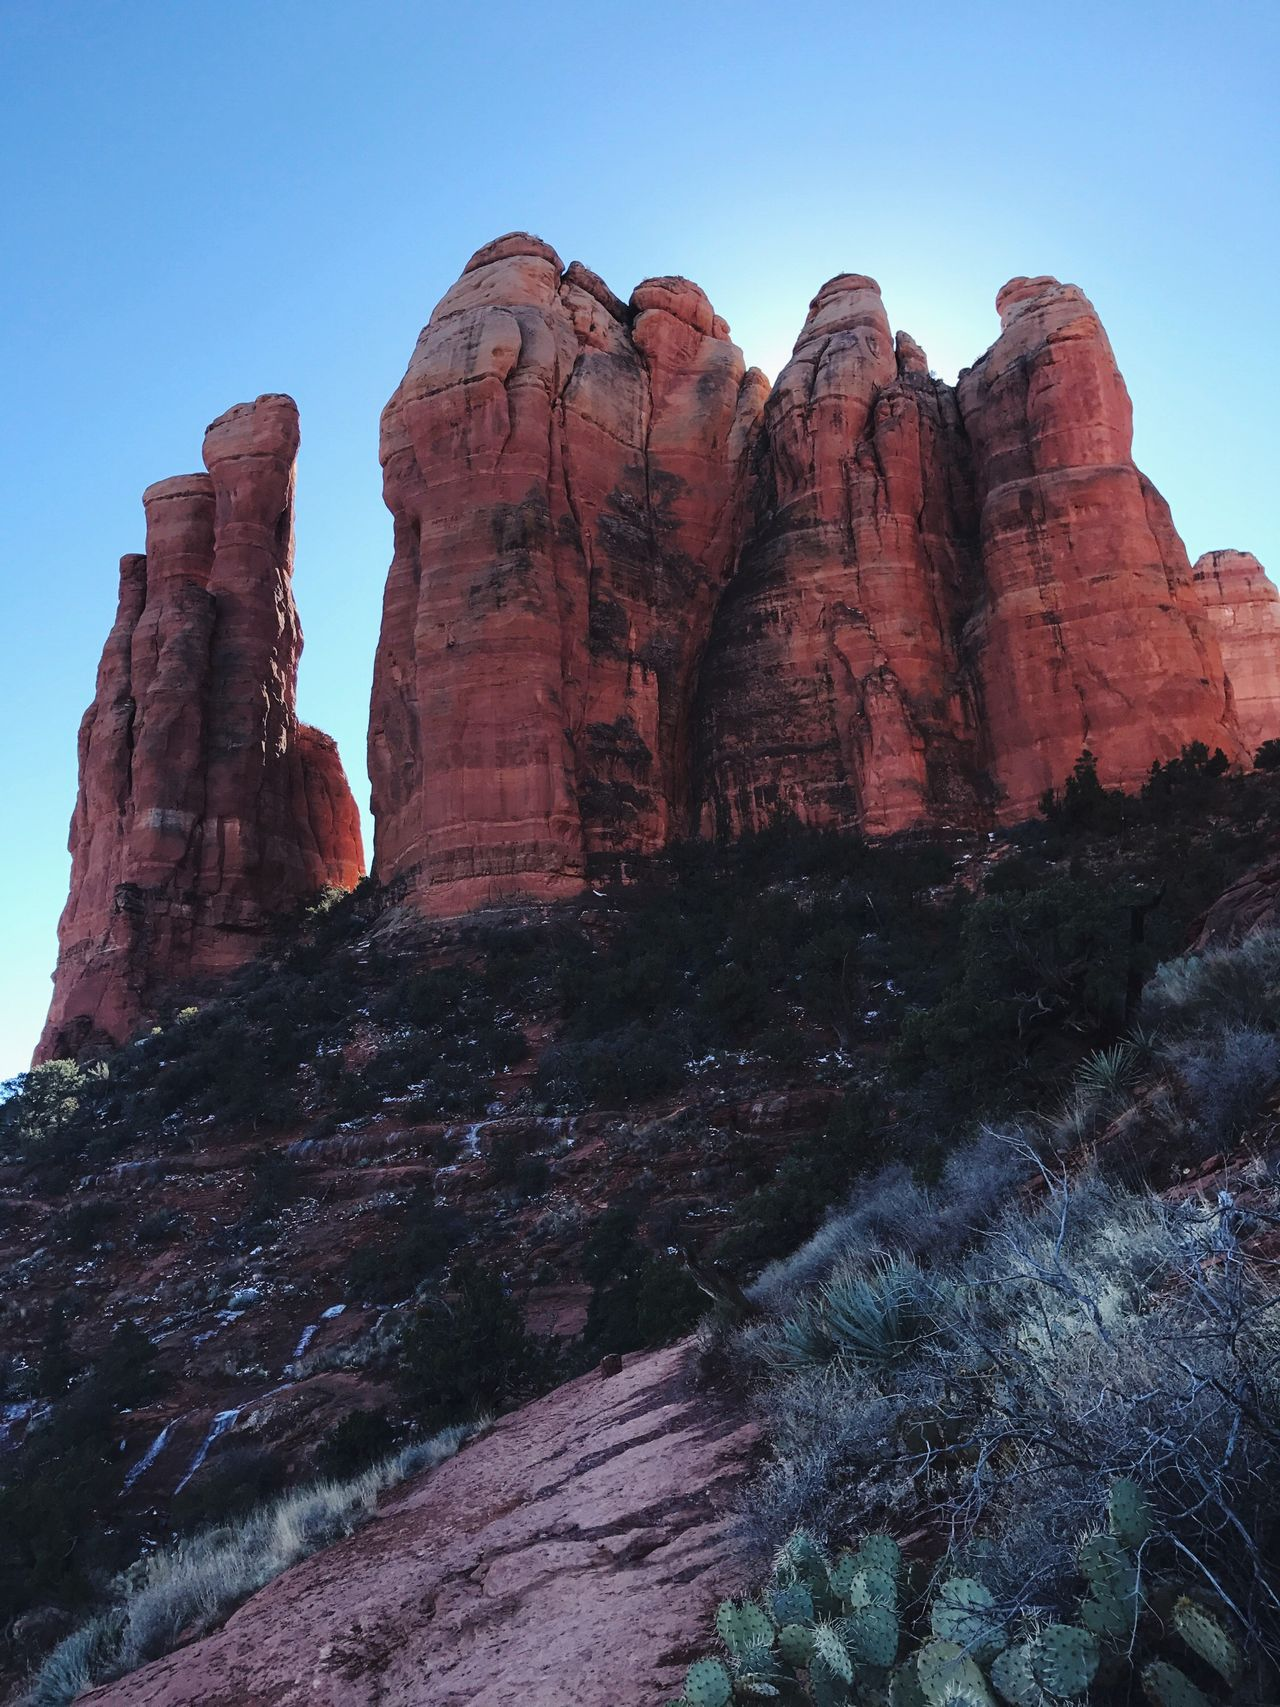 Nature Clear Sky Scenics Outdoors Landscape Arizona. Photography EyeEmNewHere